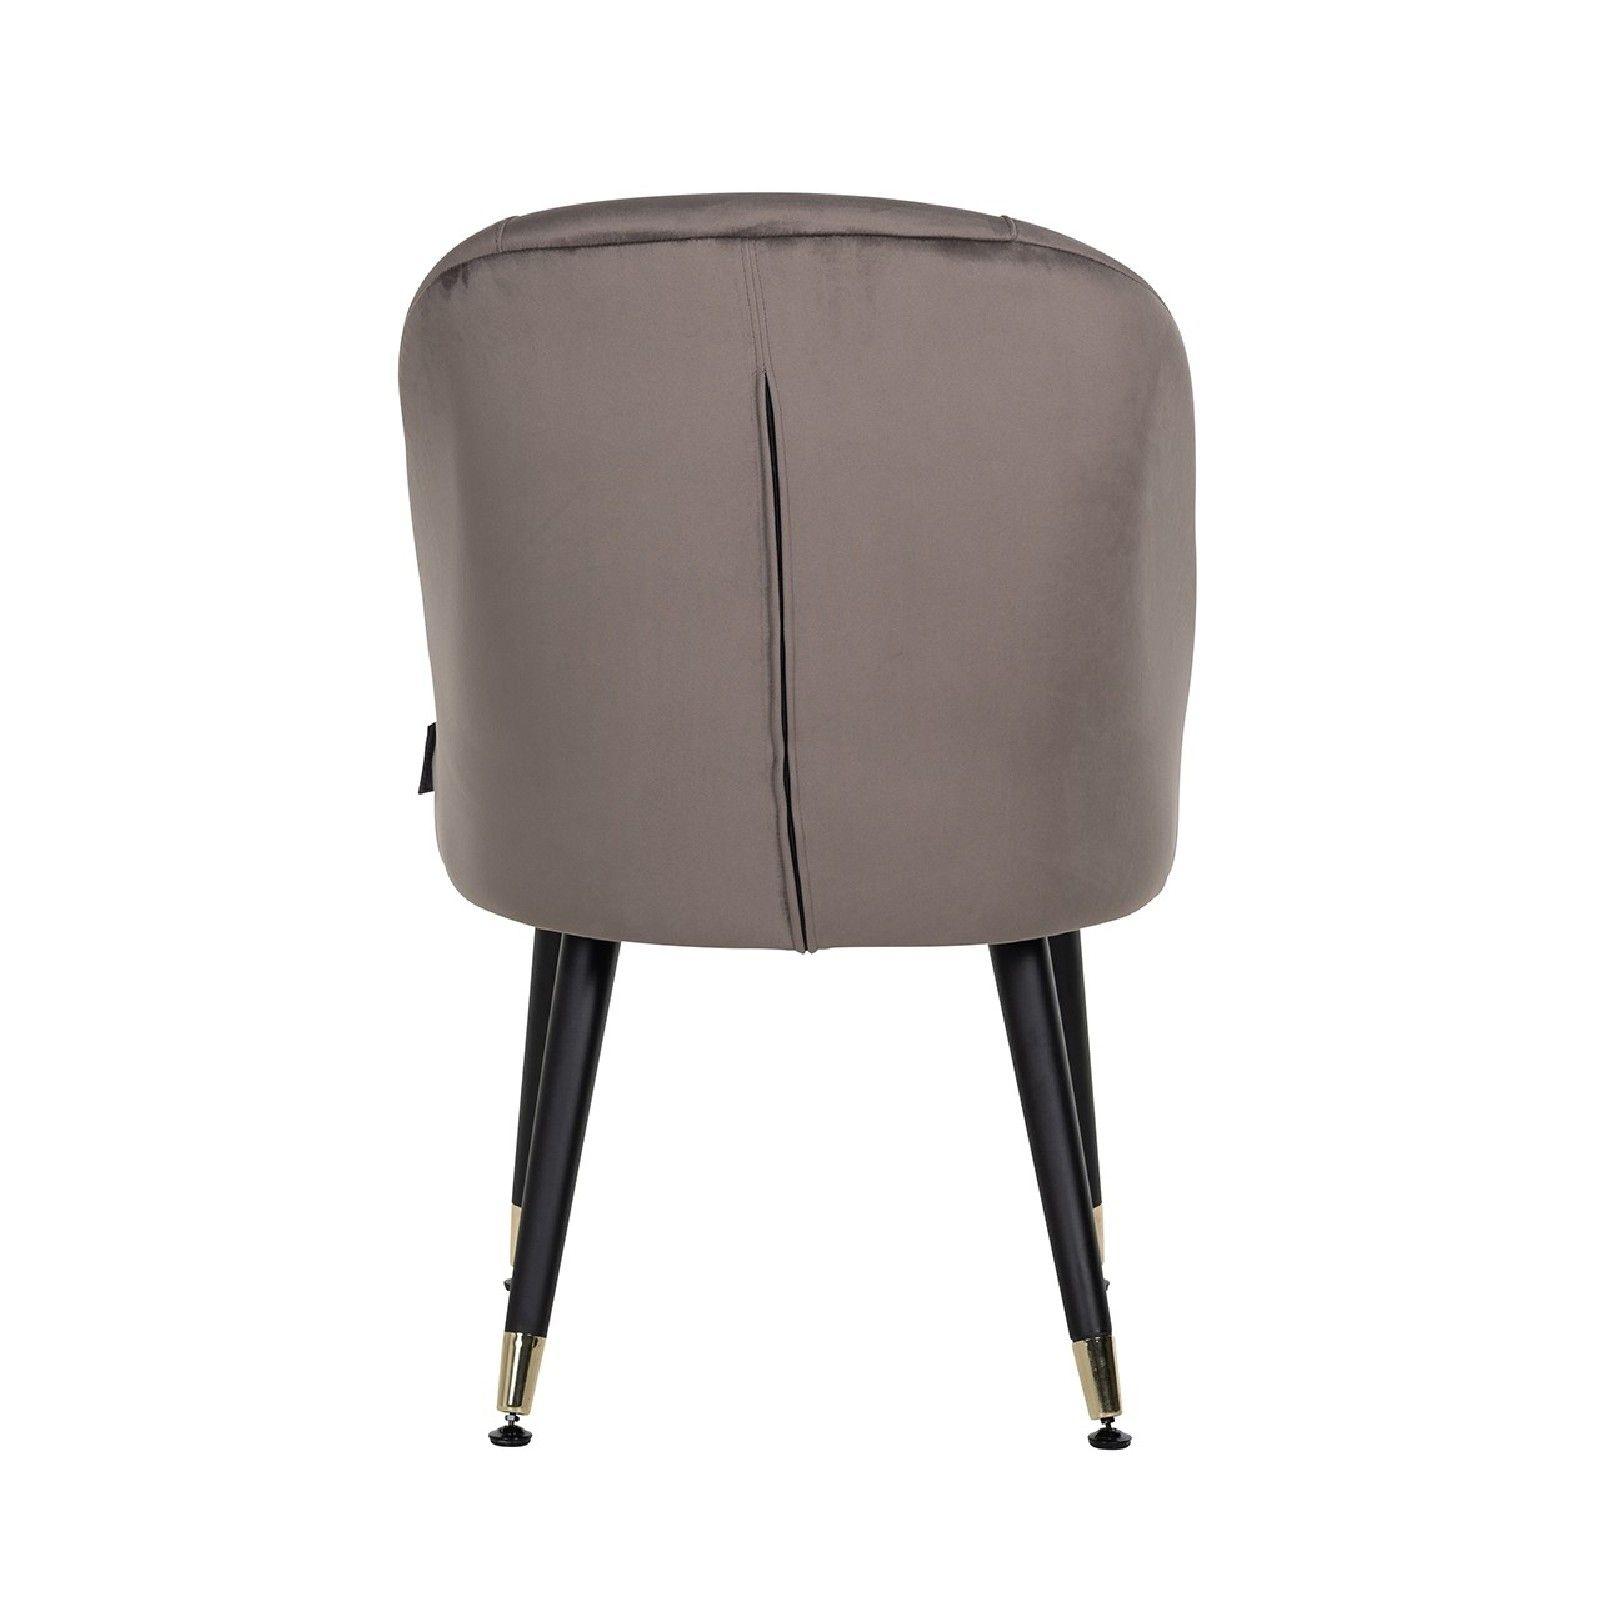 Chaise Julius Stone Velvet, Gold footcap Salle à manger - 44